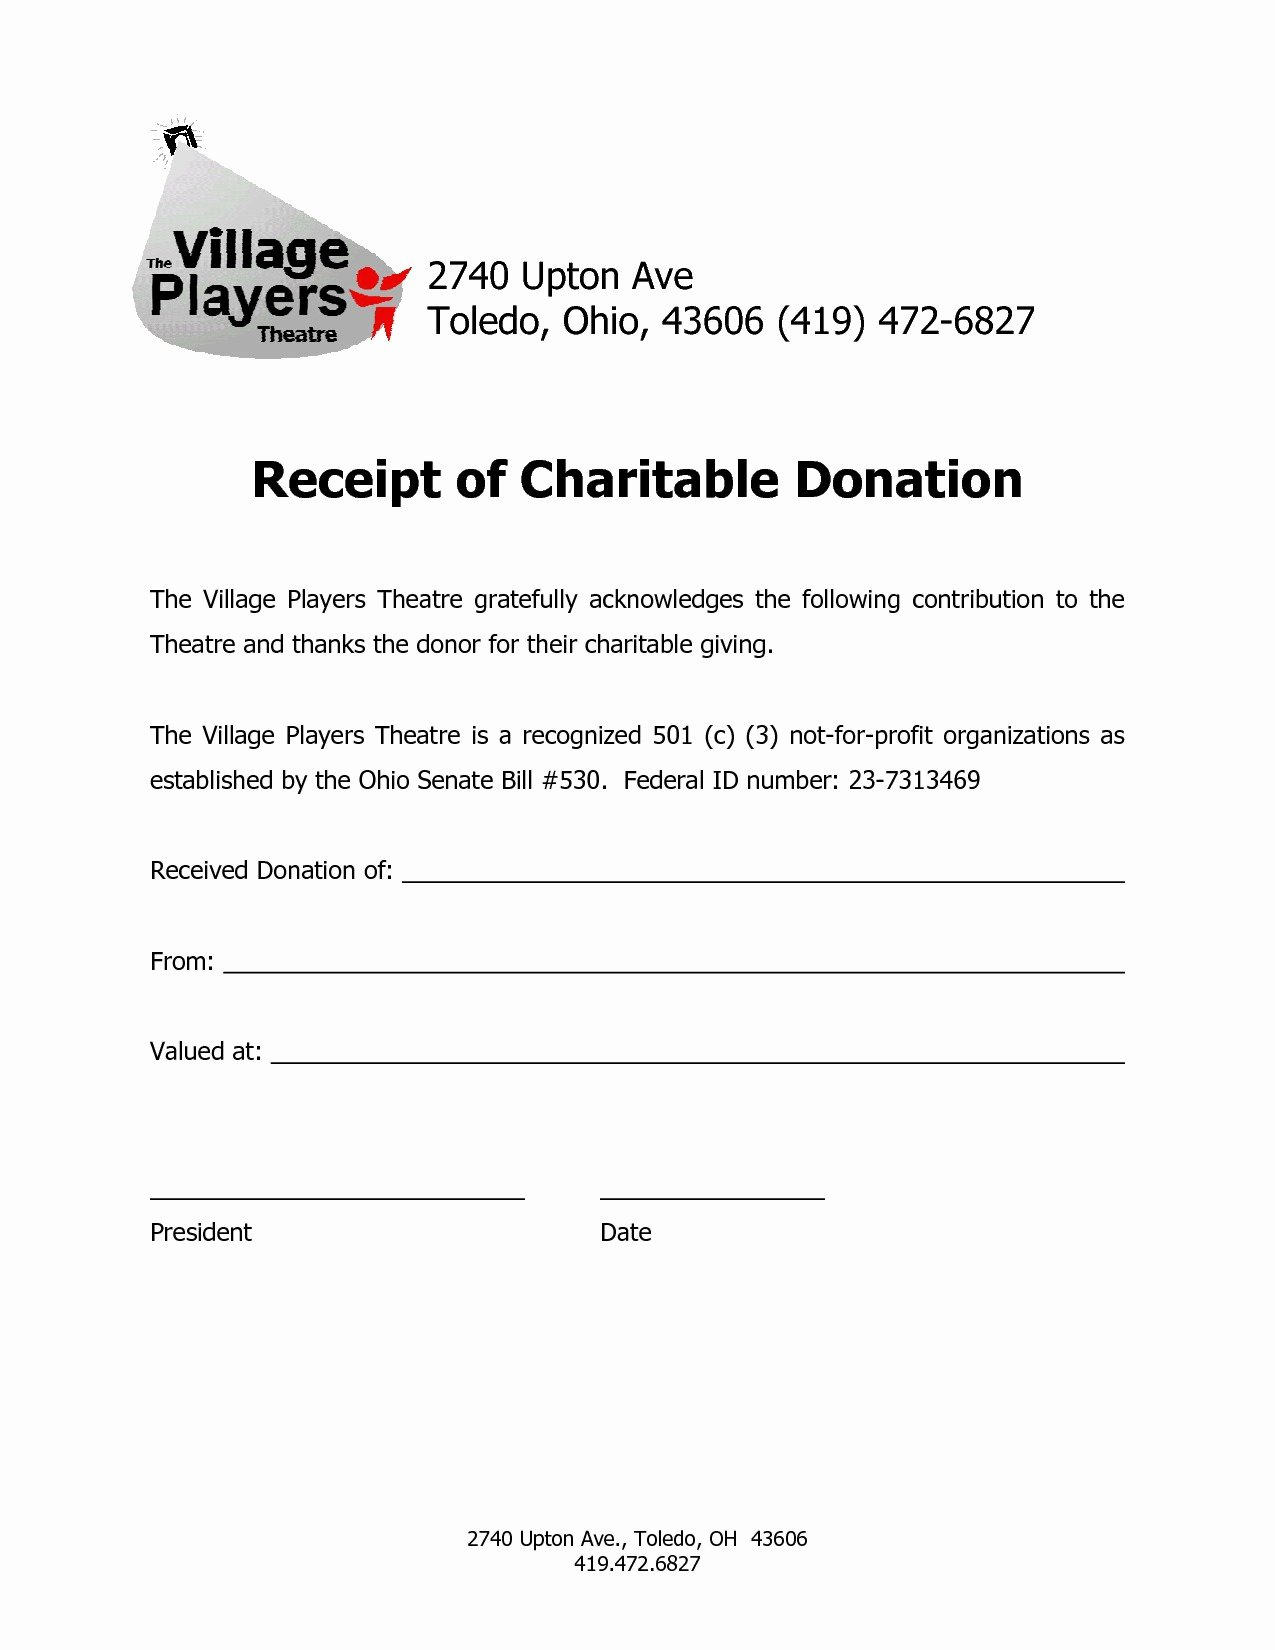 Non Cash Donation Receipt Template Best Of Non Profit Tax Deduction Letter Template Collection